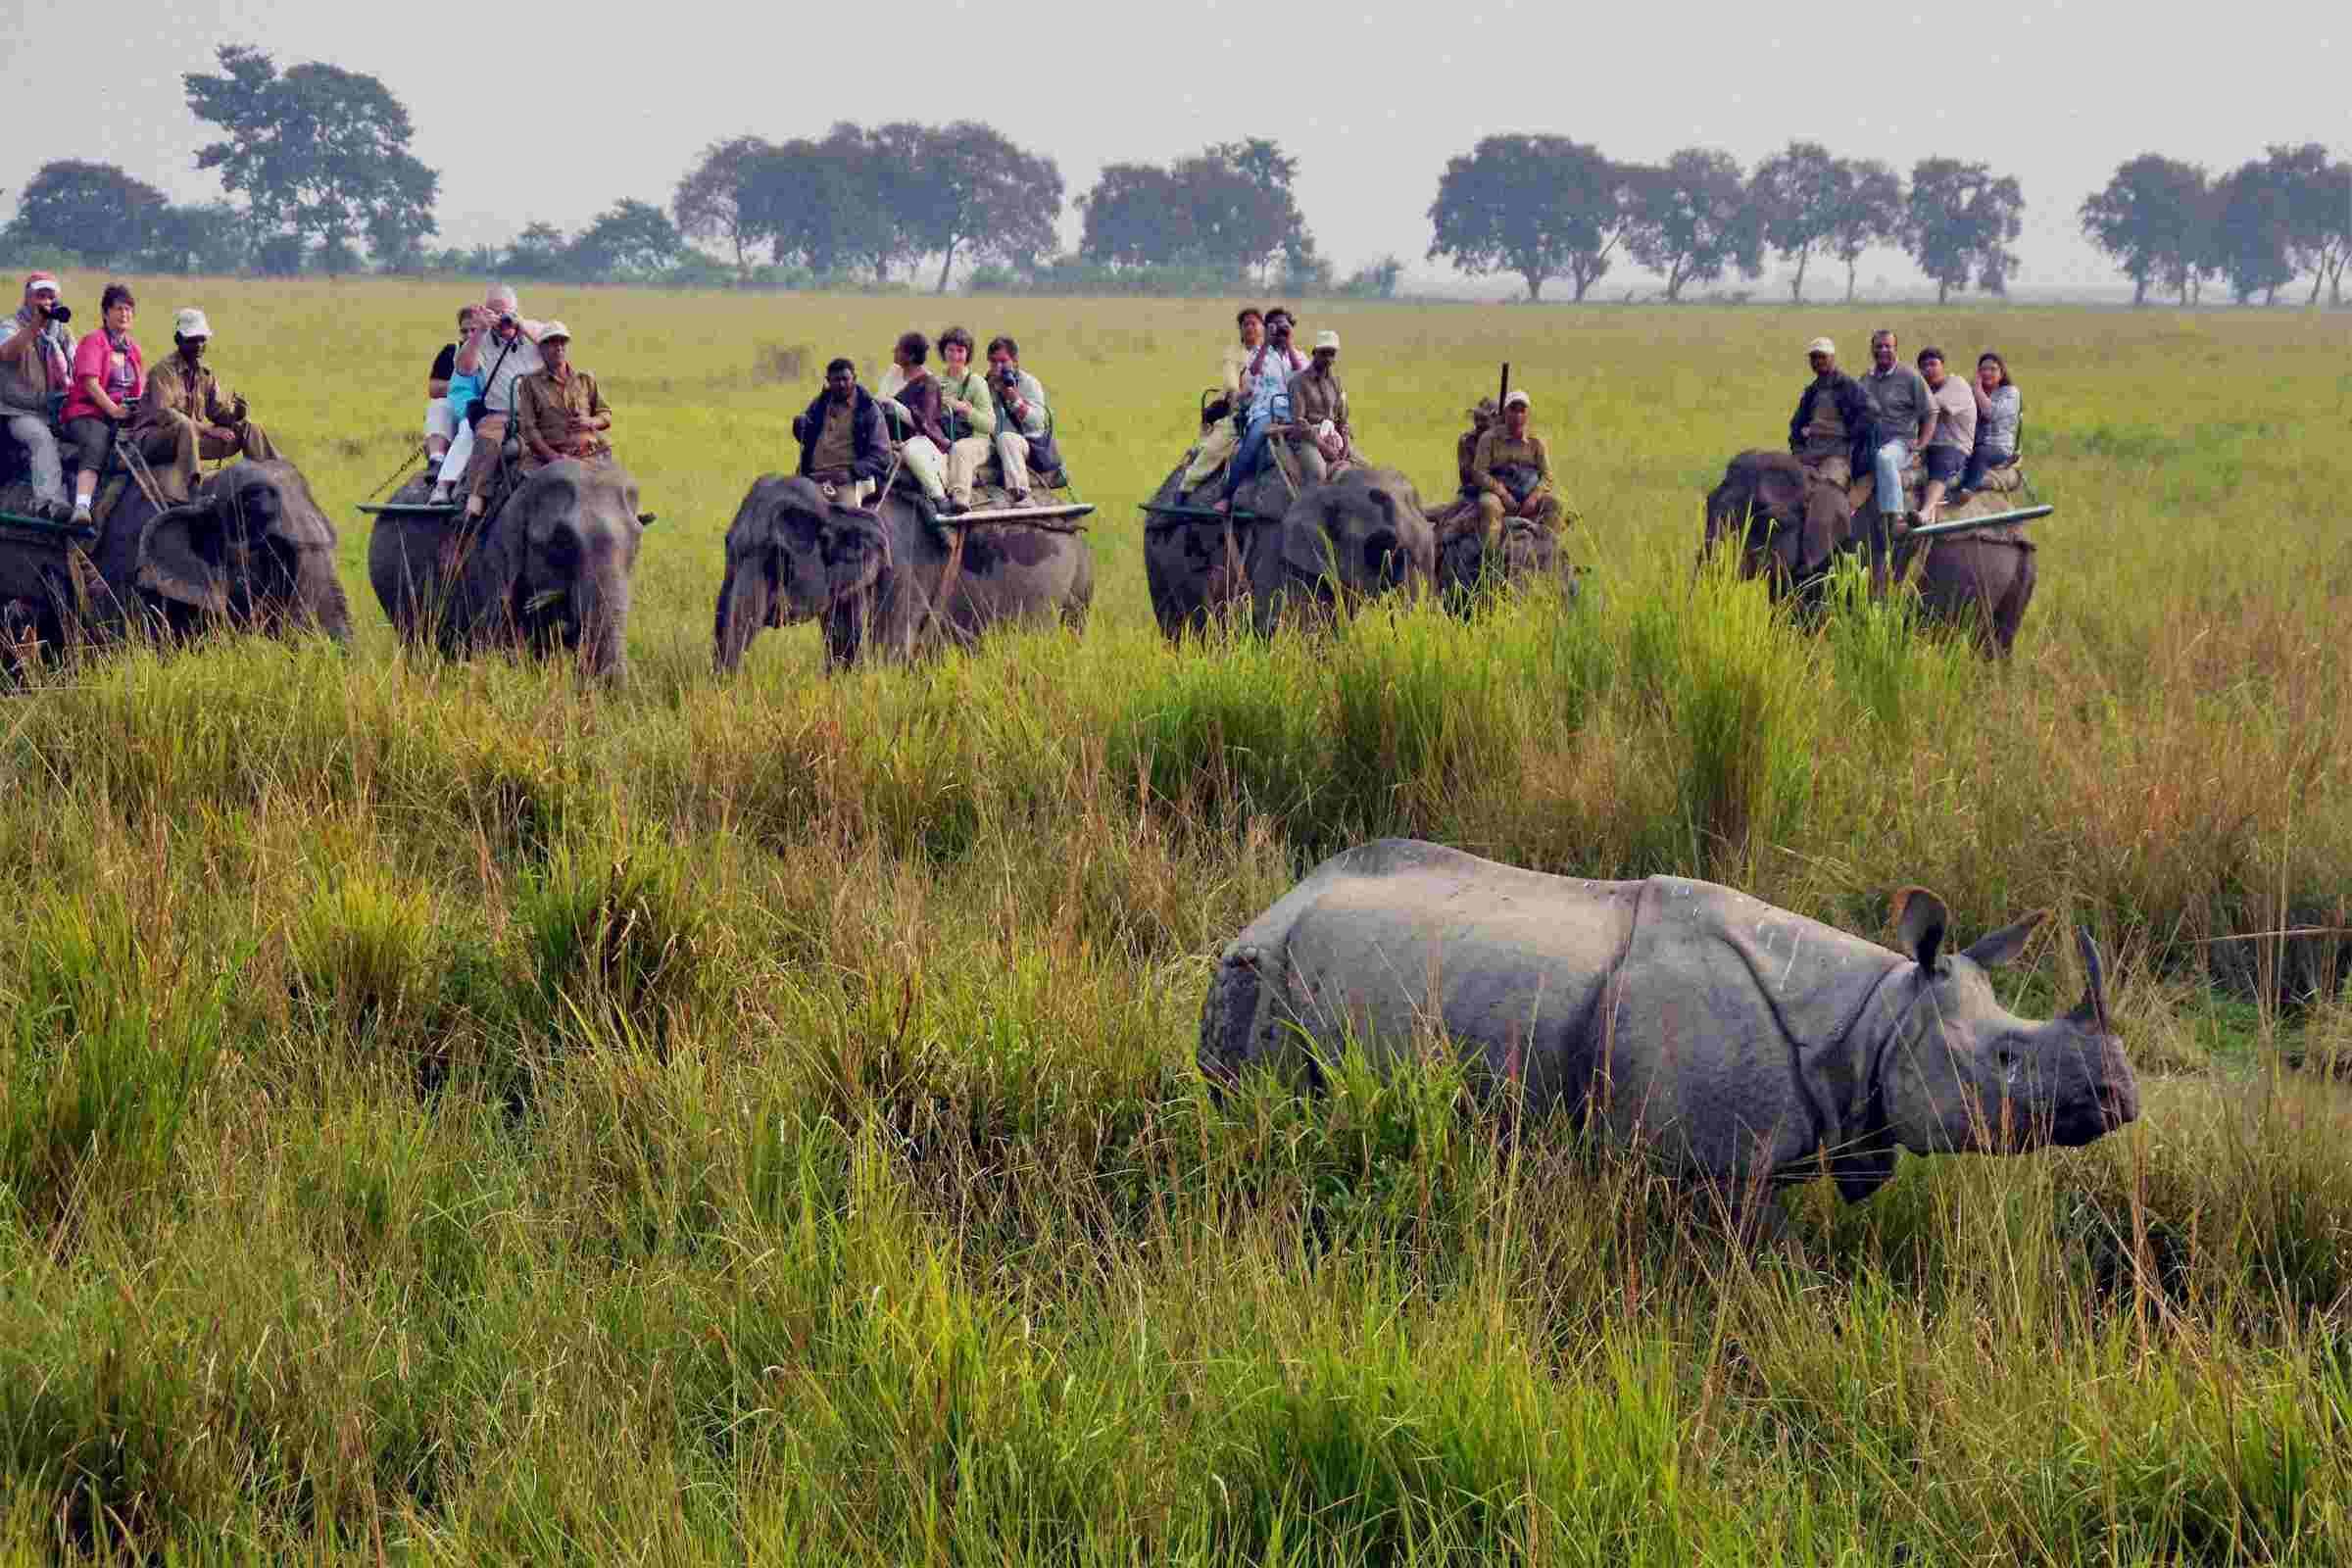 Sight seeing, Things to do in Kaziranga National Park